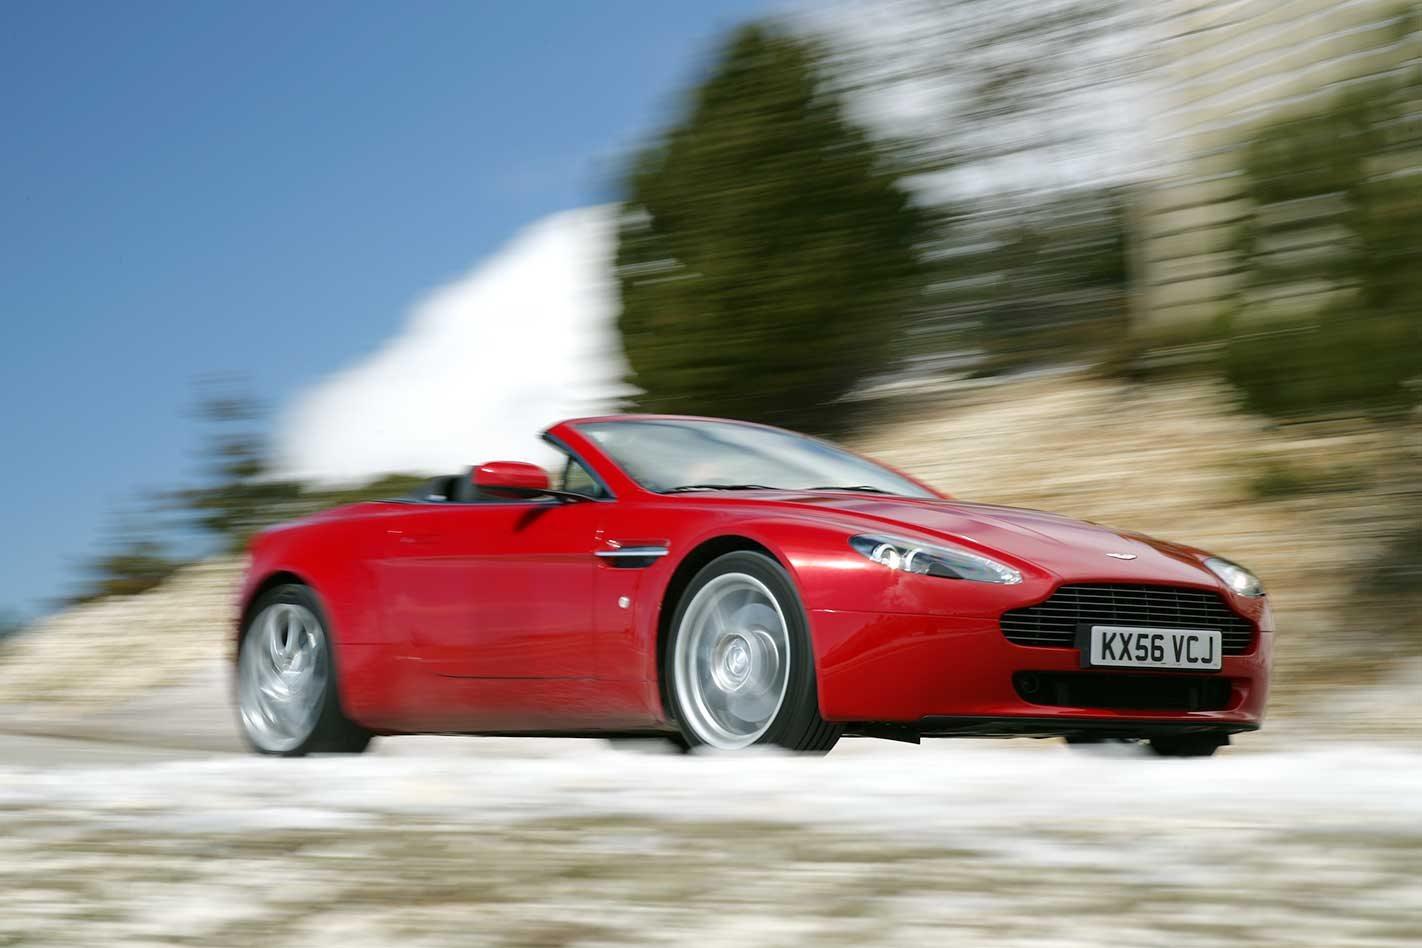 Aston Martin V Vantage Roadster Review Classic MOTOR - 2007 aston martin v8 vantage